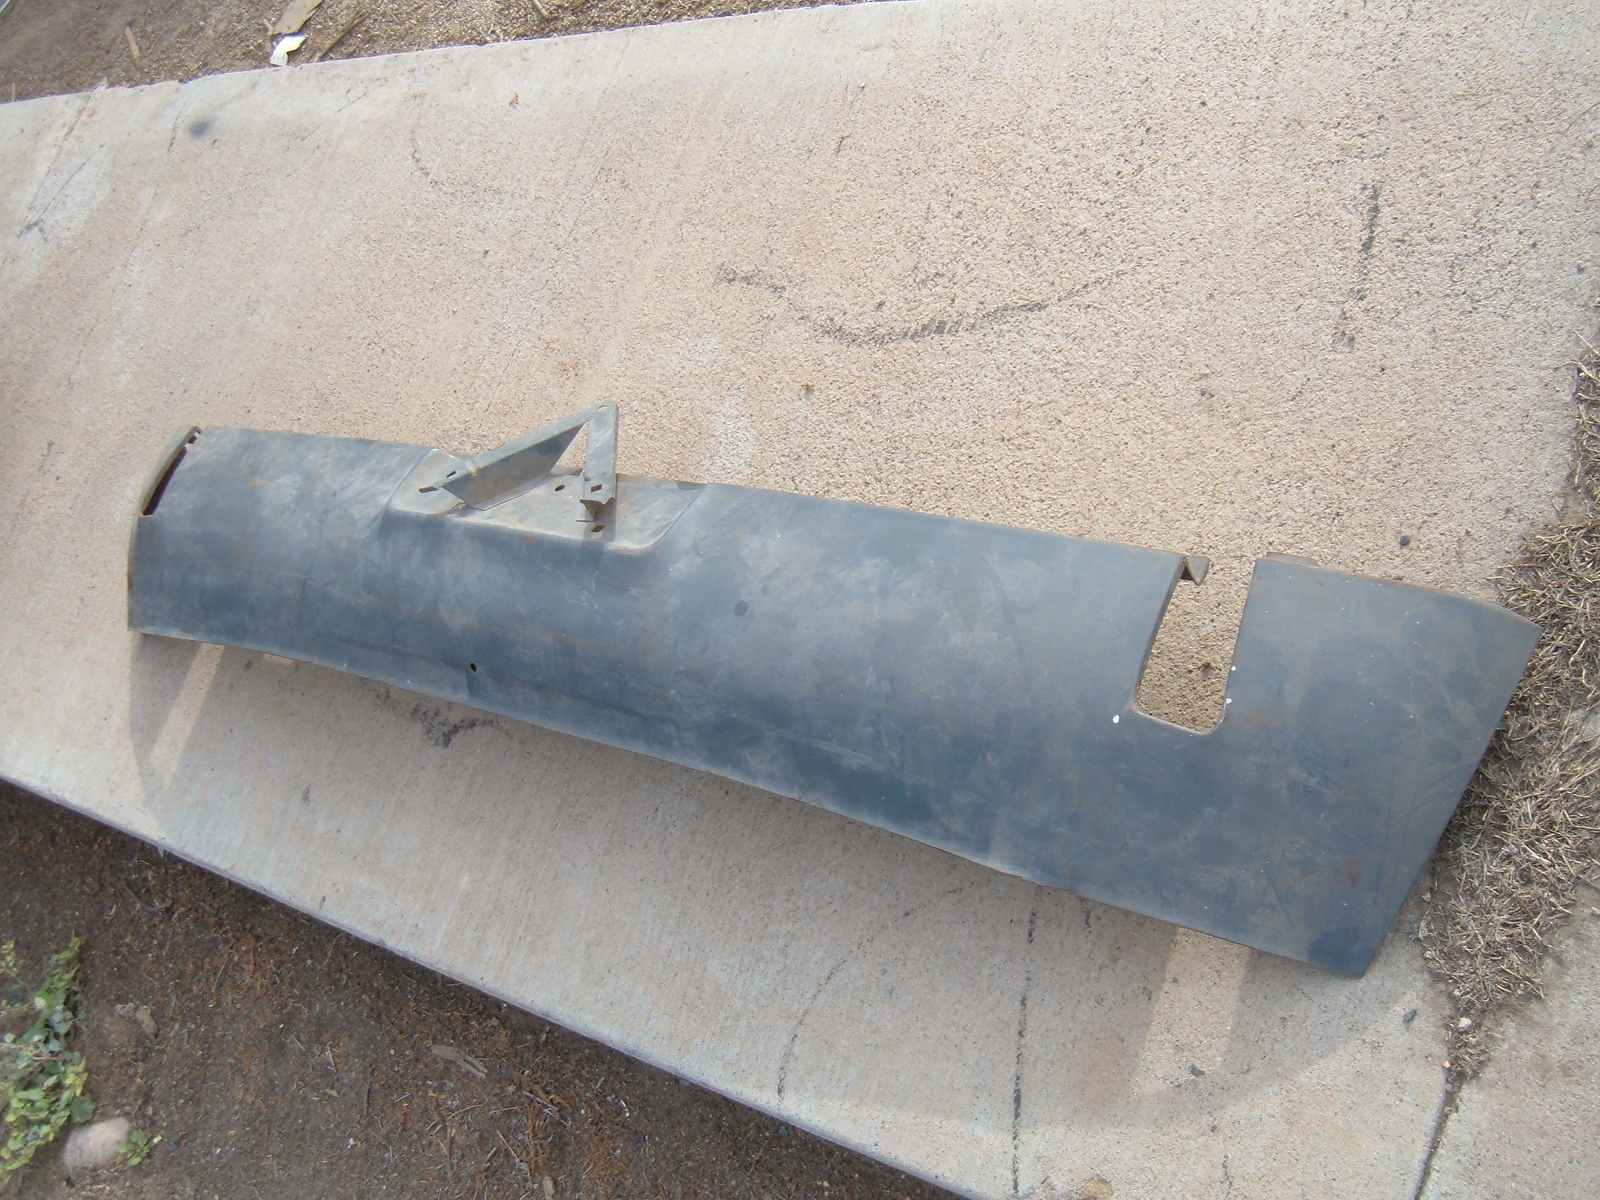 1971 72 73 74 dodge challenger rear lower valance noa mopar # 3616800 (z 3616800)